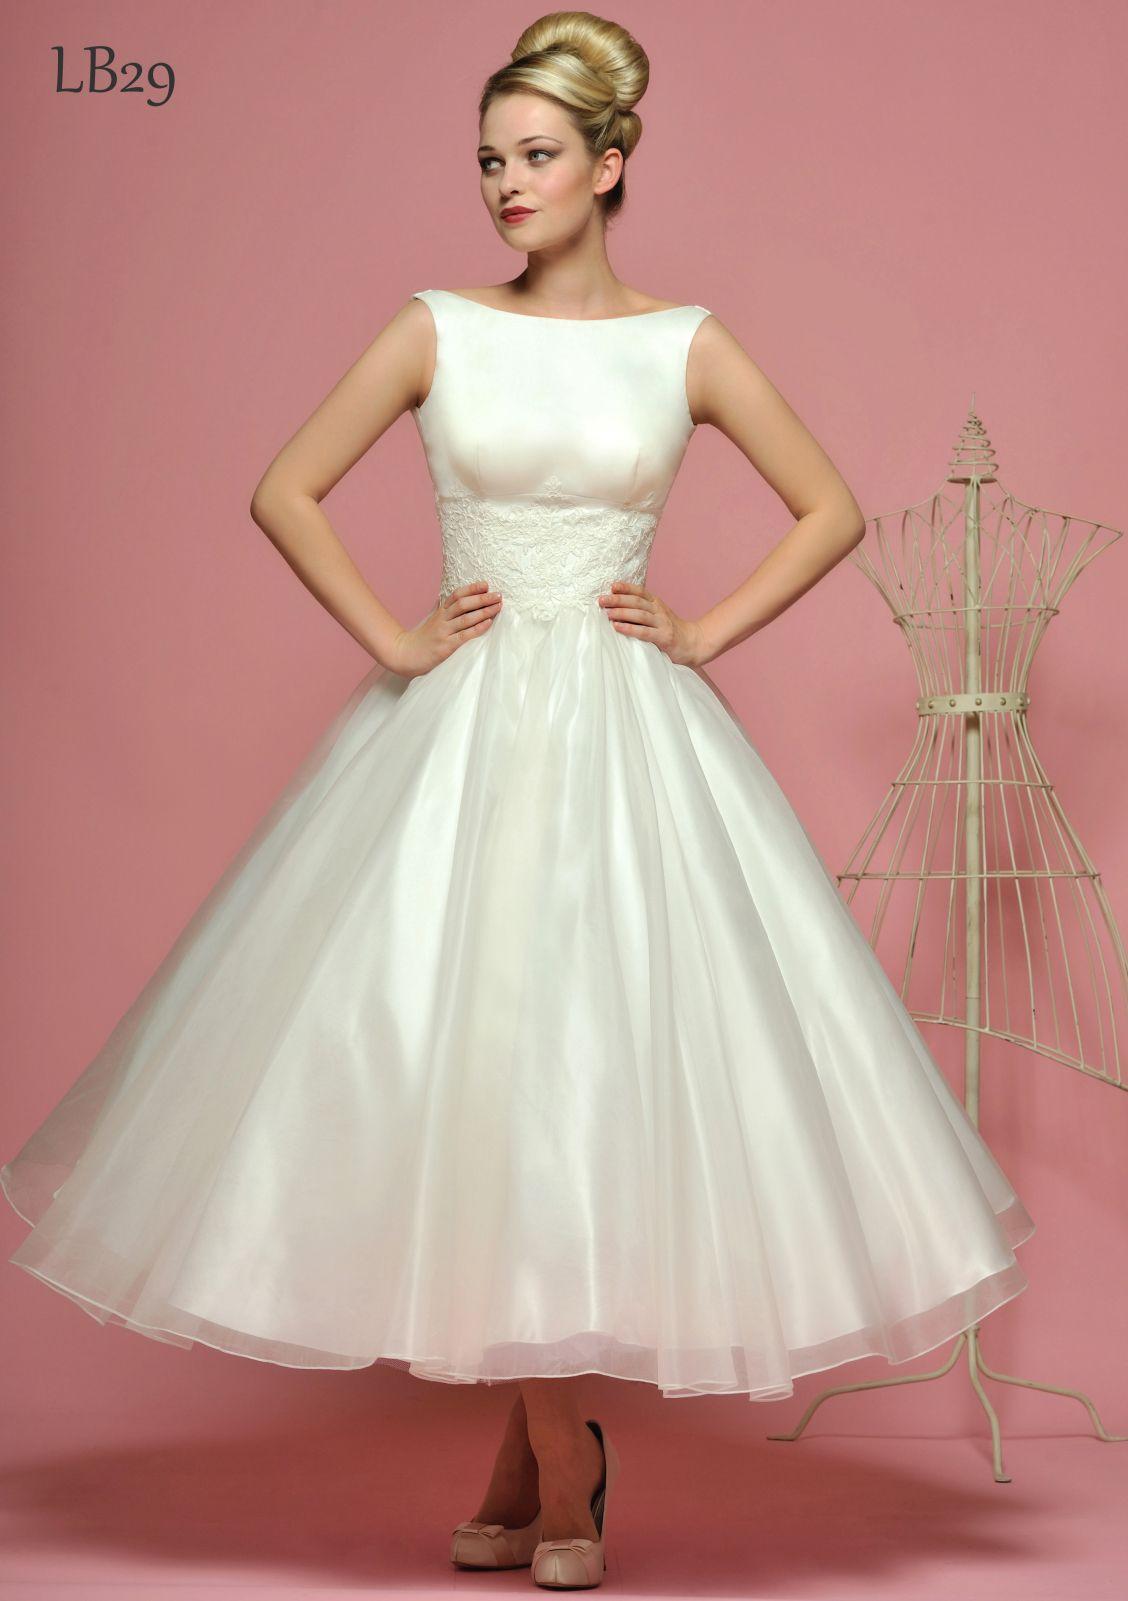 Vintage wedding tea dress  LBaF from LouLou Bridal  Wedding  Pinterest  Wedding dress